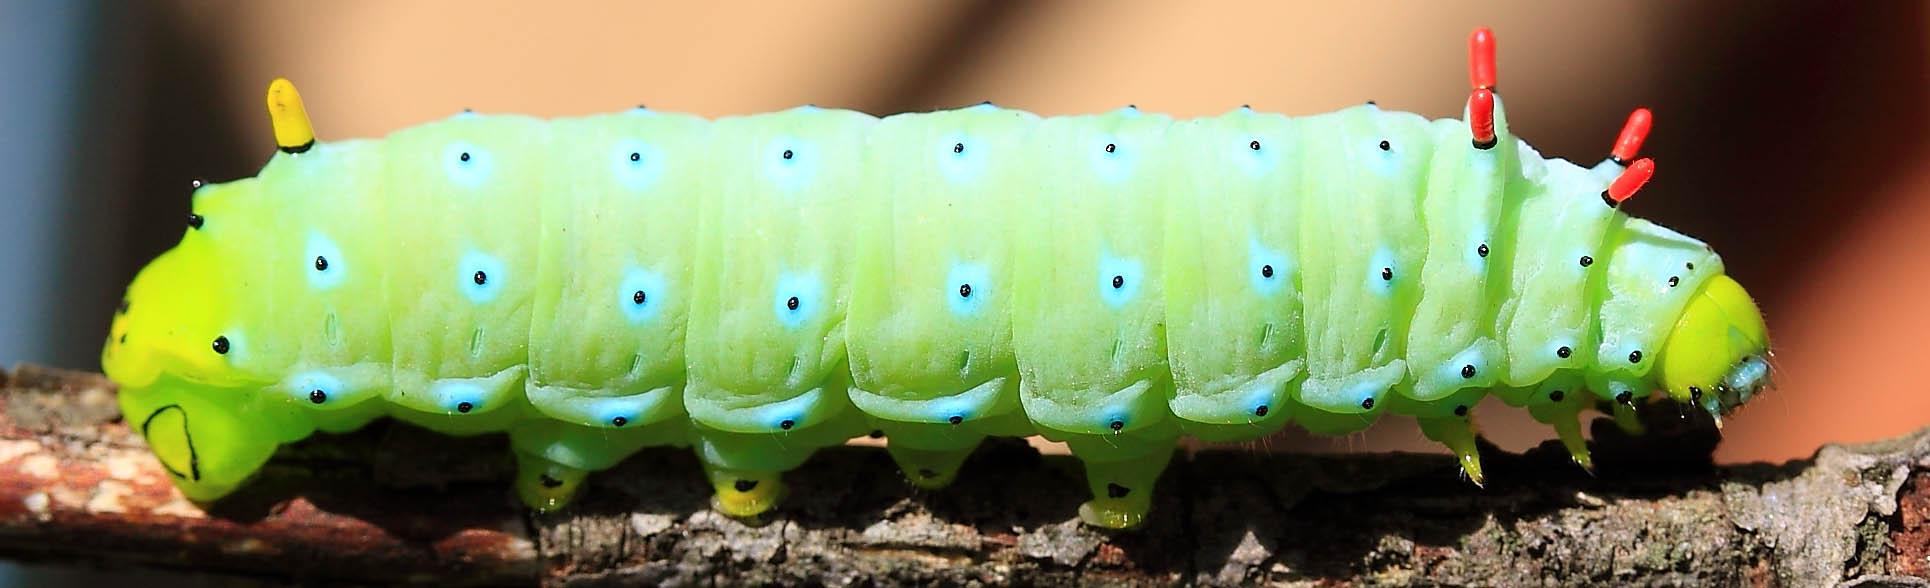 2012 Silkworm 8070-2.jpg